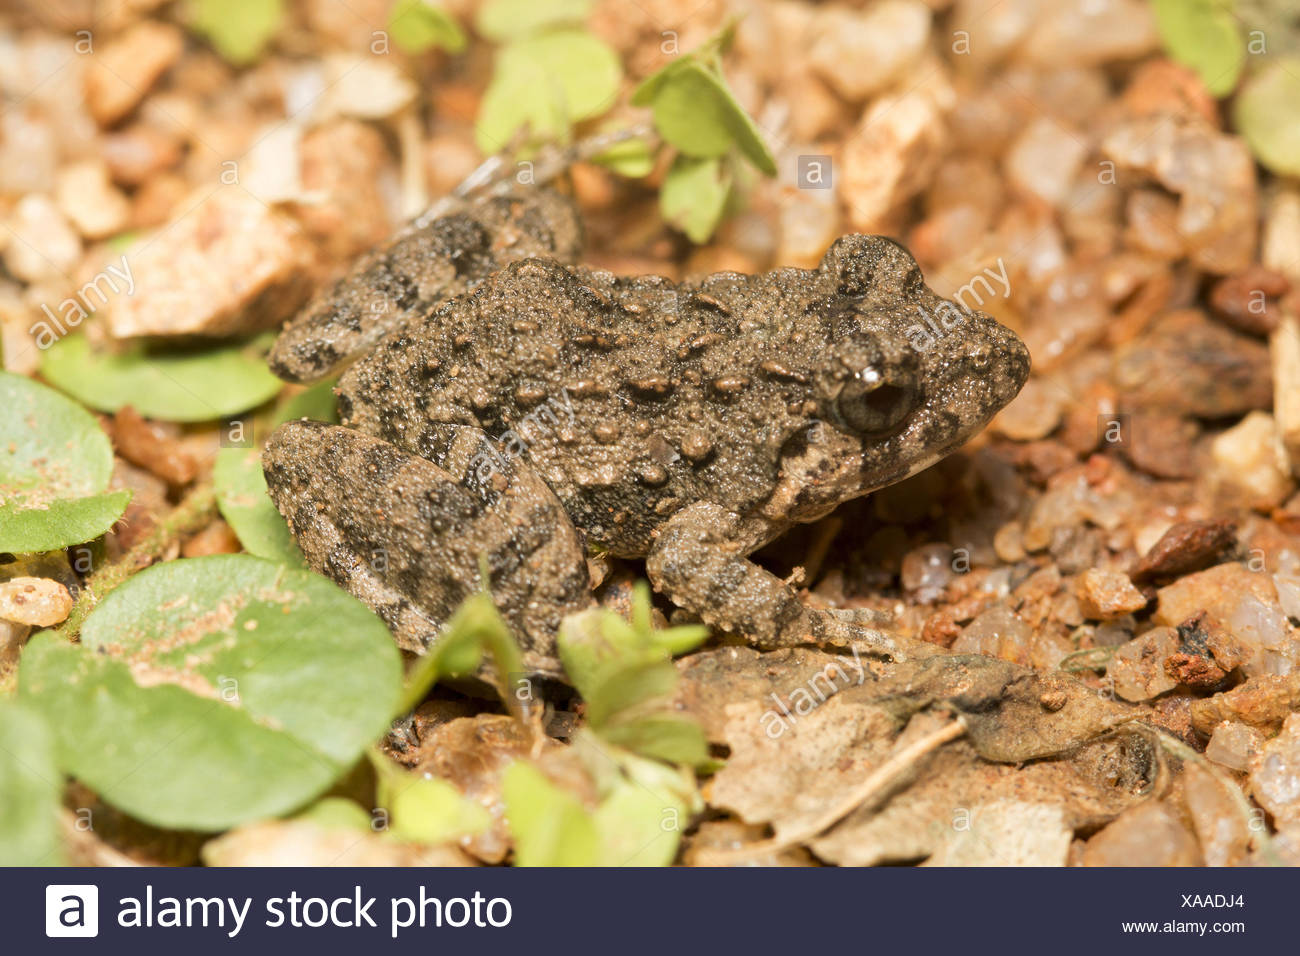 Cricket frog, Fejervarya sp., Barnawapara WLS, Chhattisgarh. Dicroglossidaefamily. - Stock Image